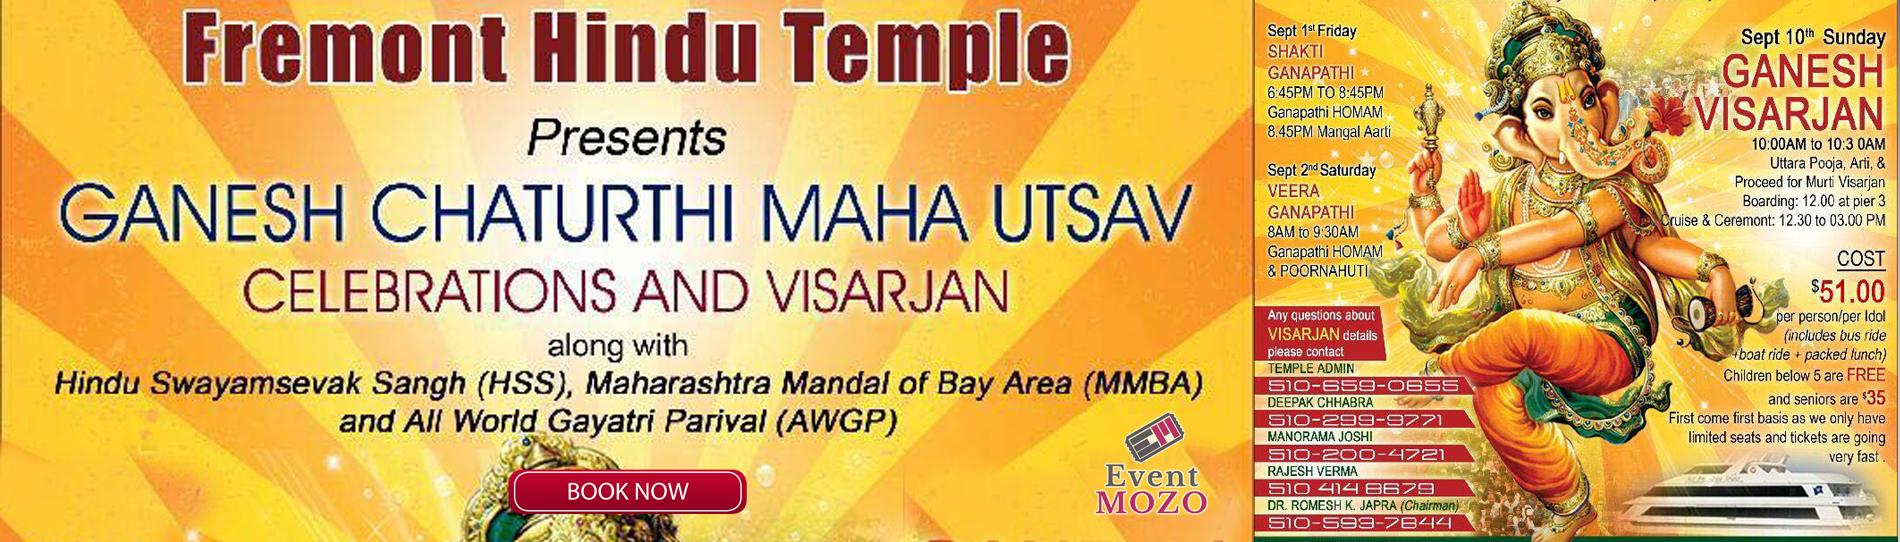 EventMozo Ganesh Chaturthi Maha Utsav  Celebrations and Visarjan 2017